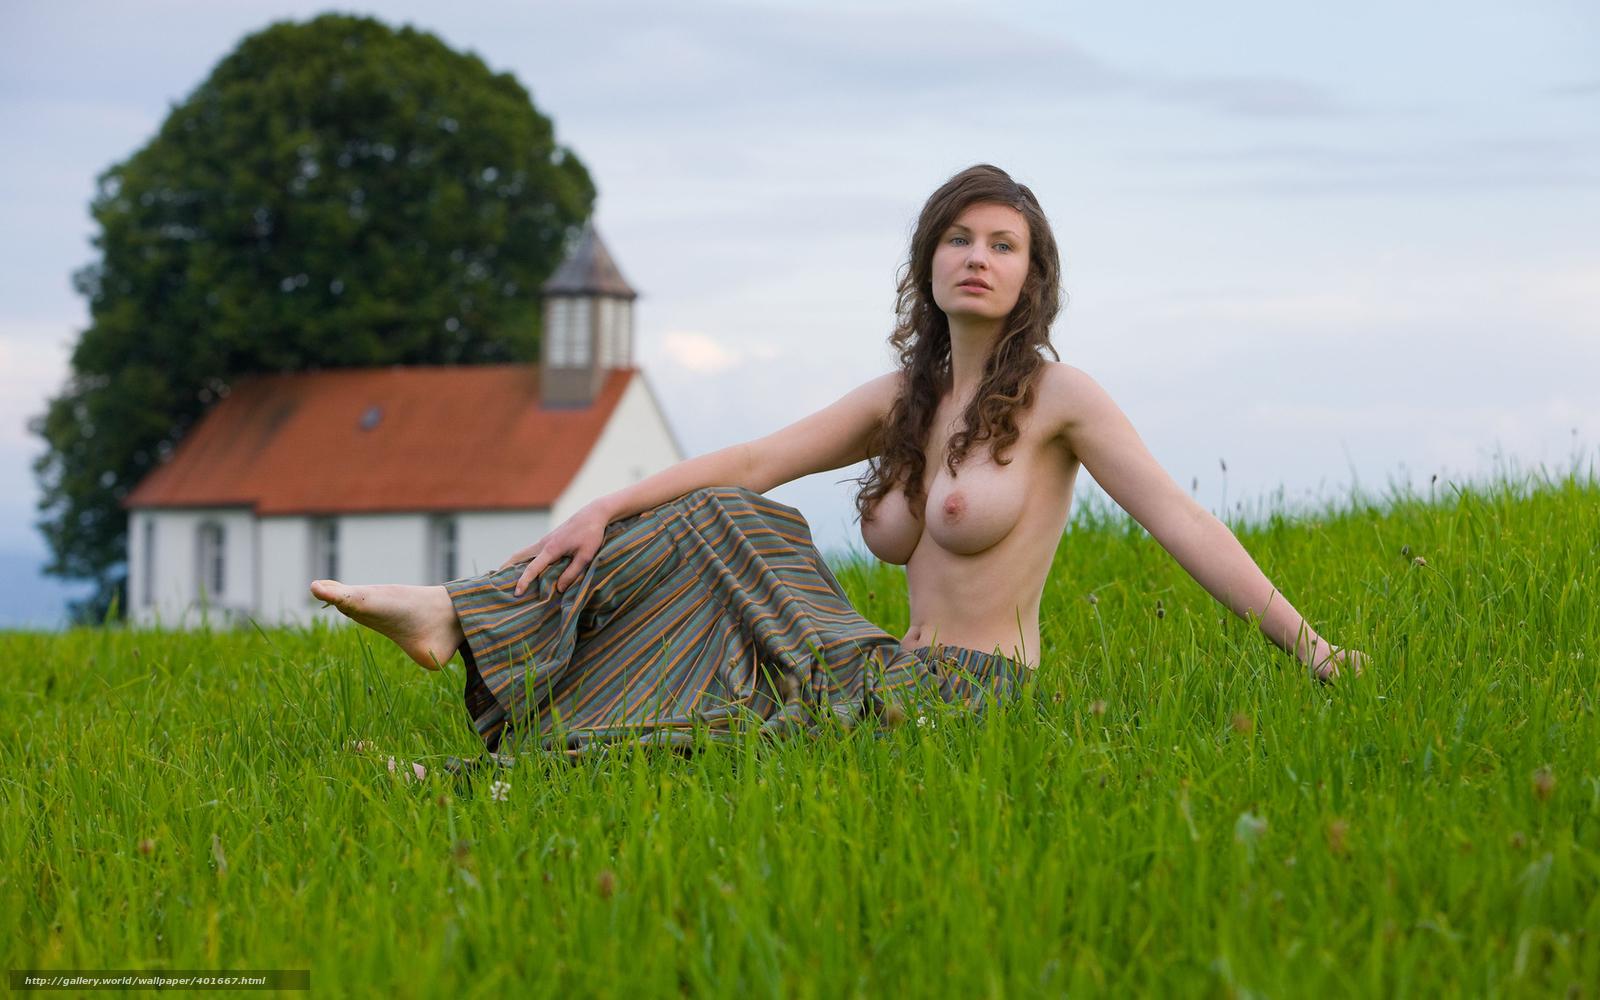 Обои, картинки поиск естественности, Sexwall.ru - секс фотки